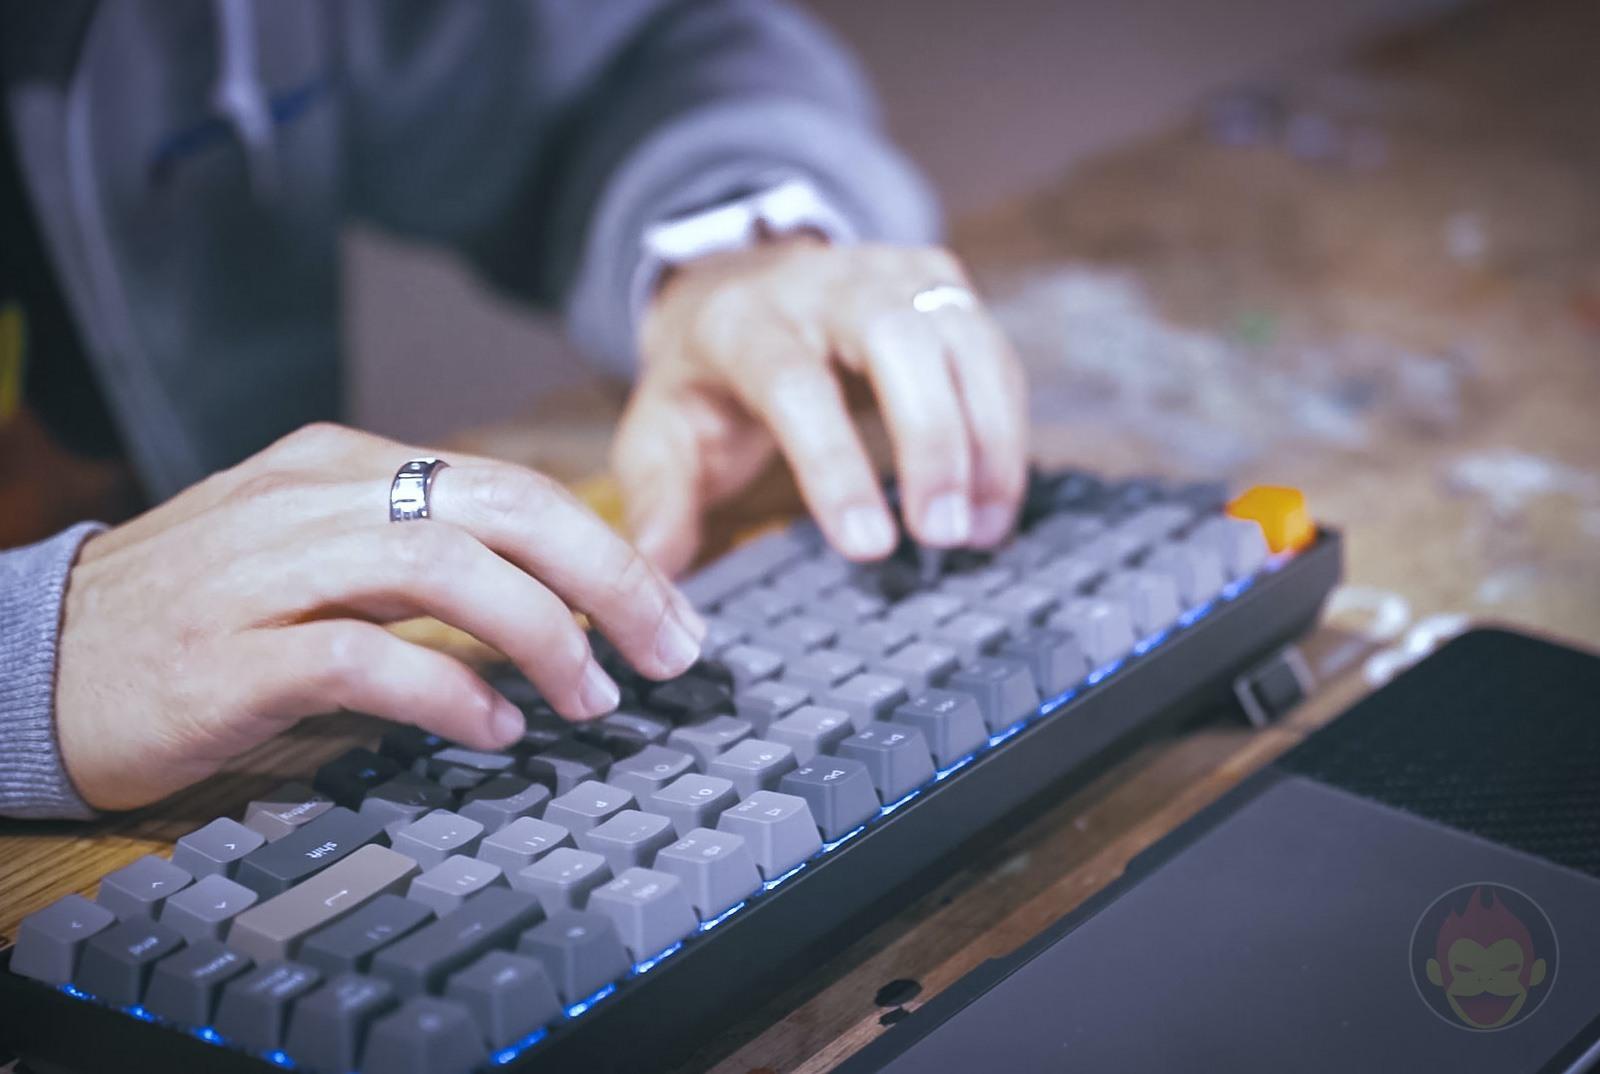 Keychron K2 Mechanical Keyboard Review 10